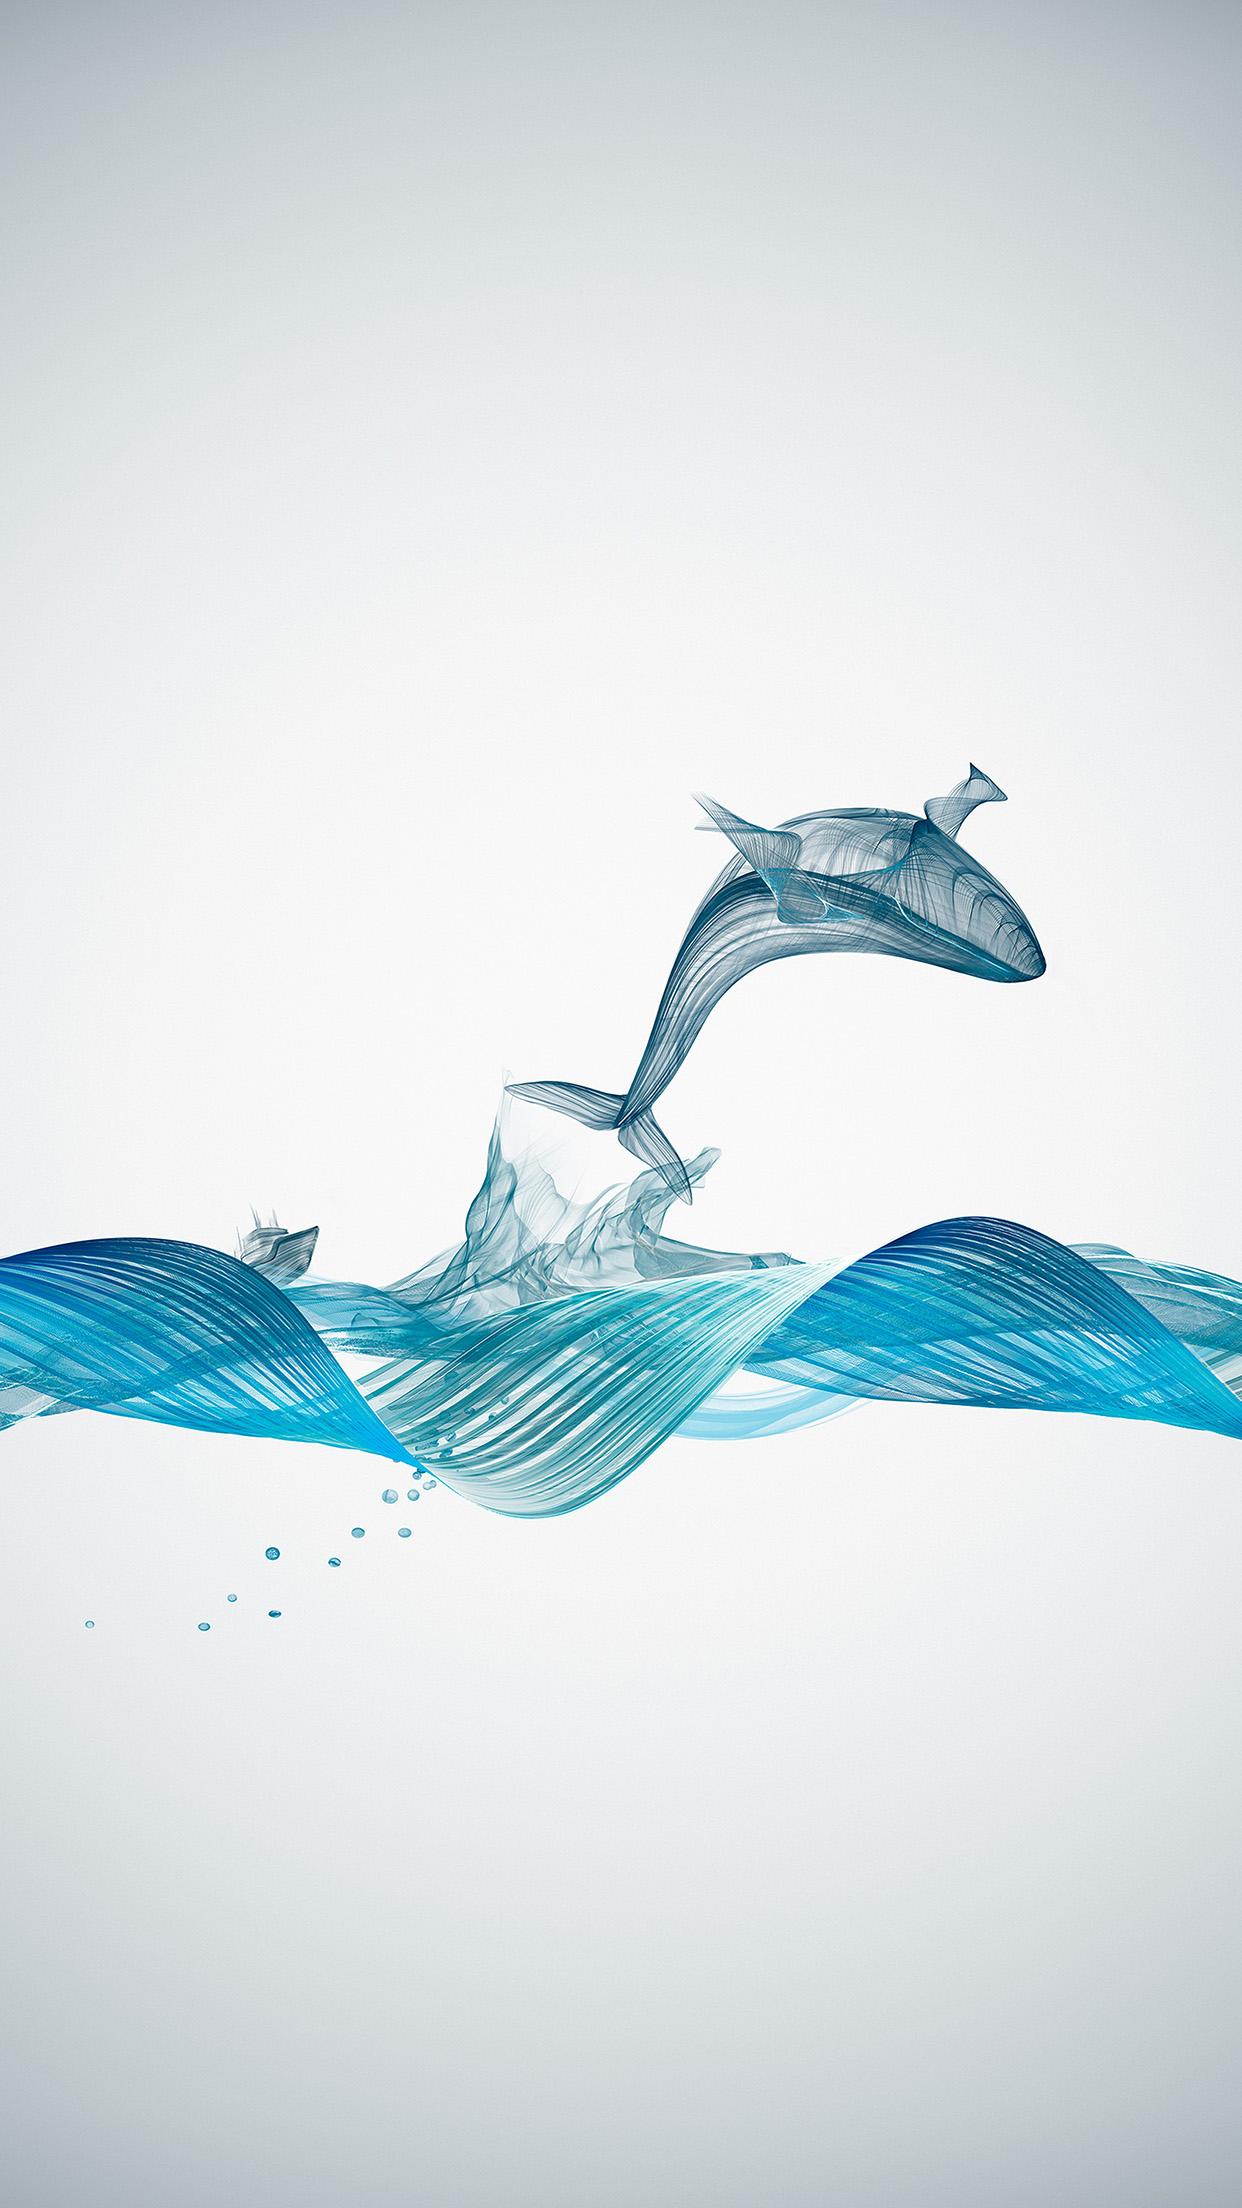 Animal Wallpaper Desktop Background Bd84 Fishing Boat Whale Wave Line Art Illustration Animal